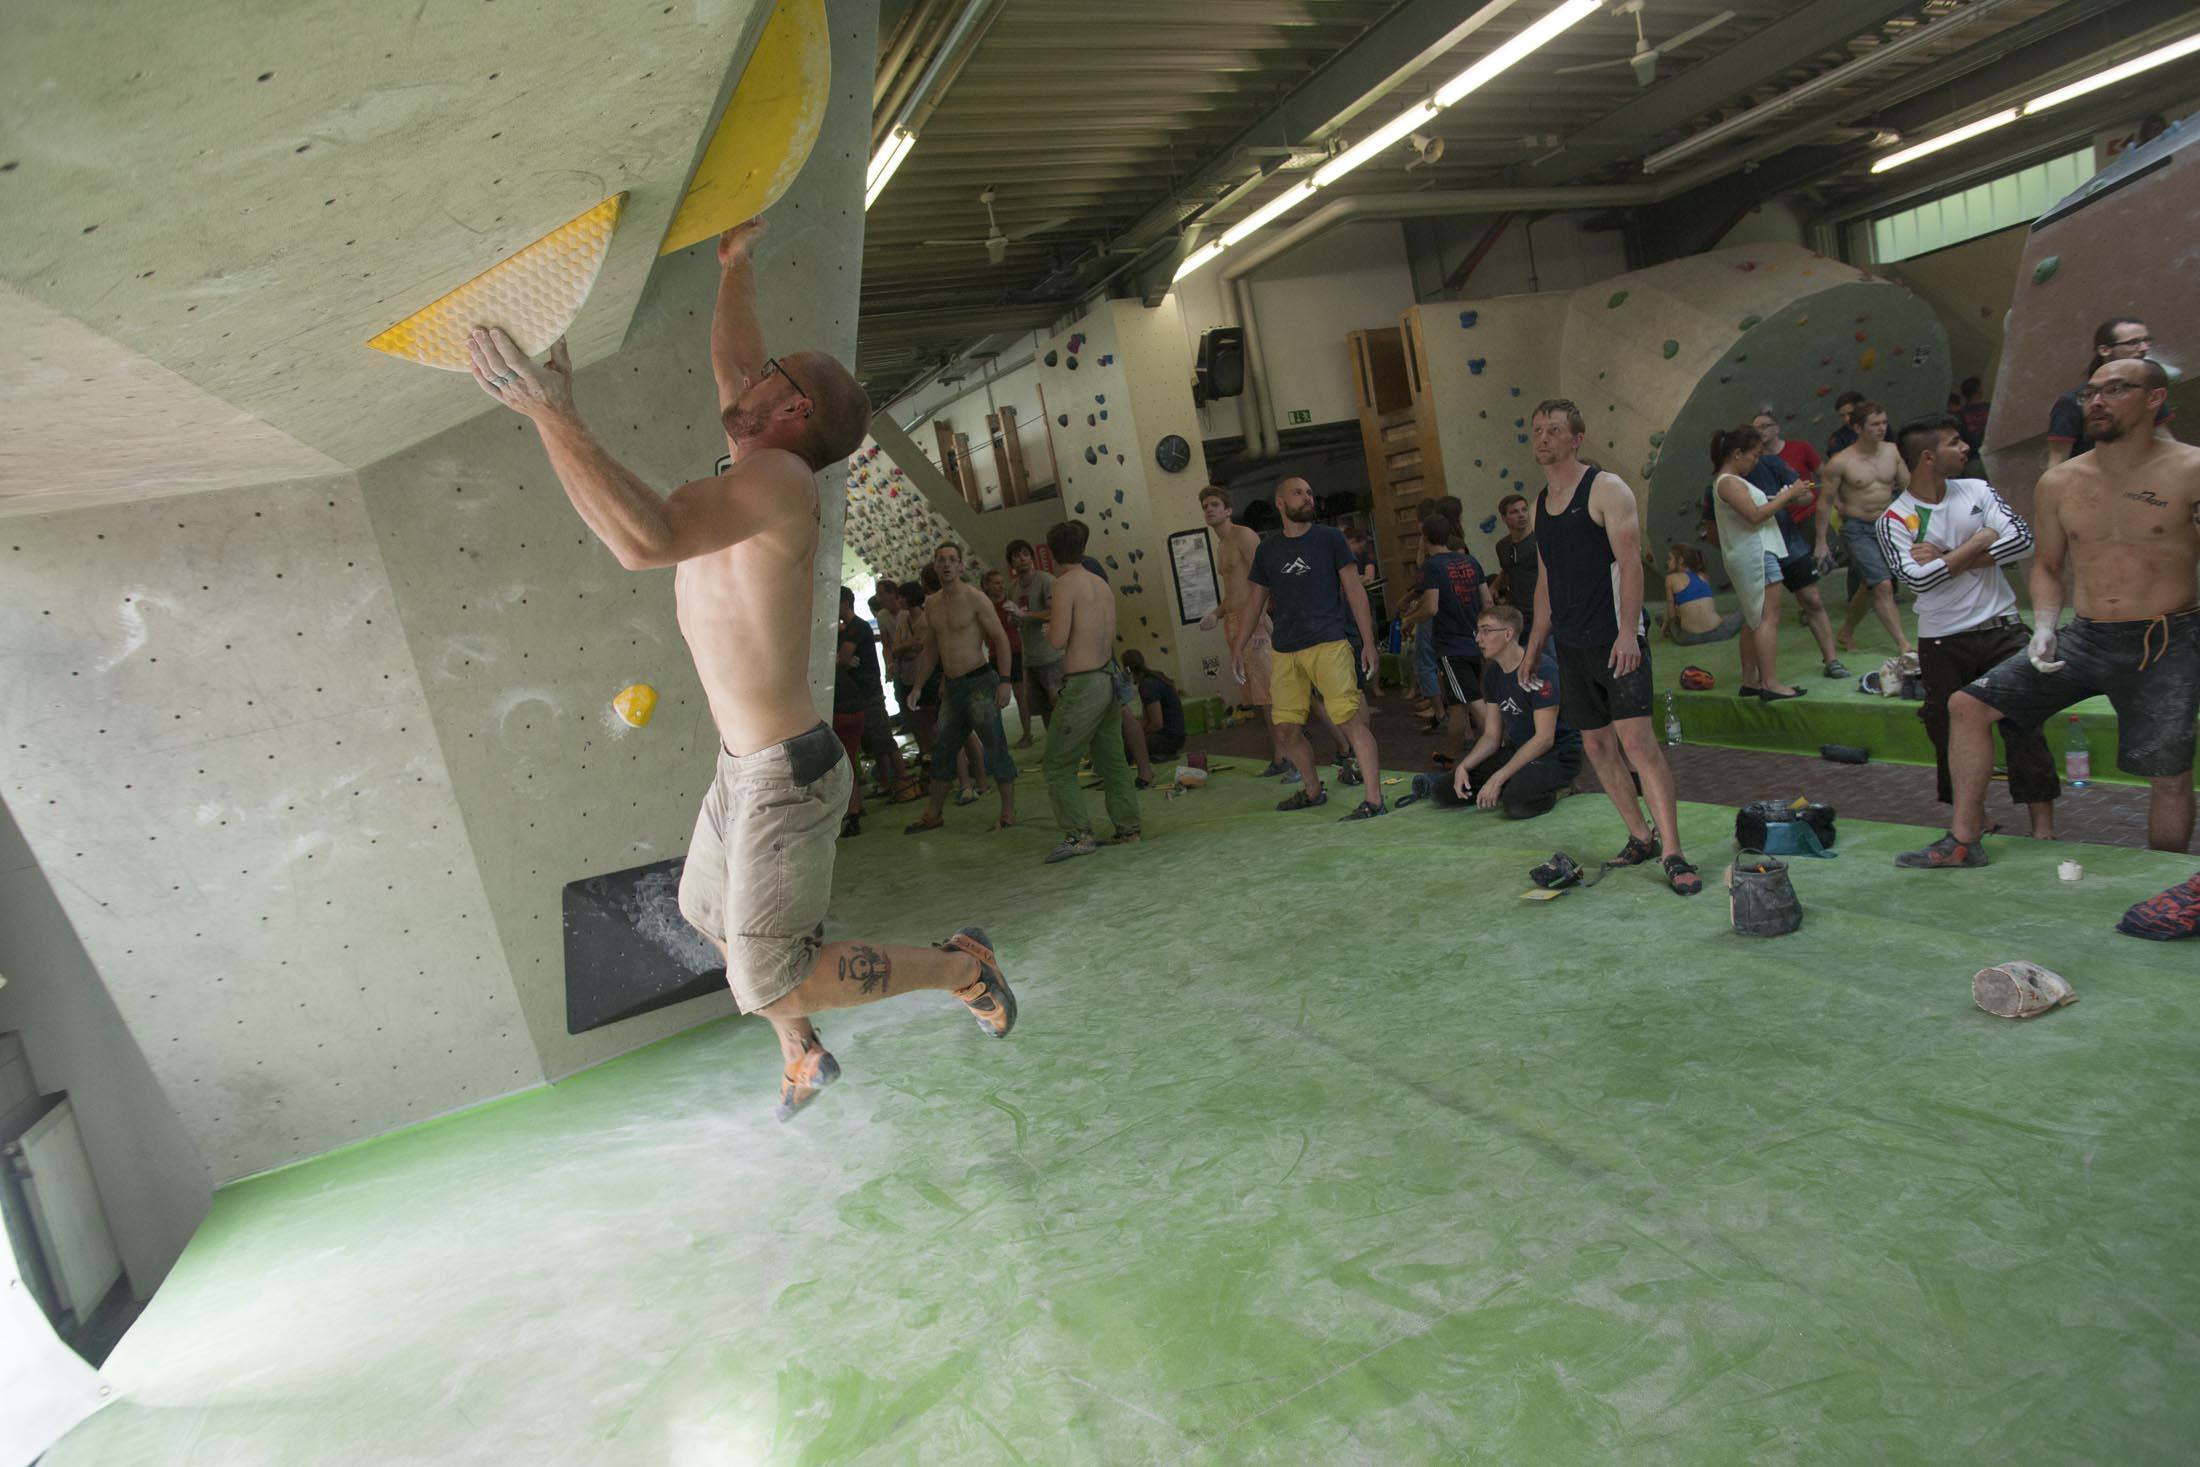 Quali, internationaler bouldercup Frankenjura 2016, BLOCKHELDEN Erlangen, Mammut, Bergfreunde.de, Boulderwettkampf07092016413